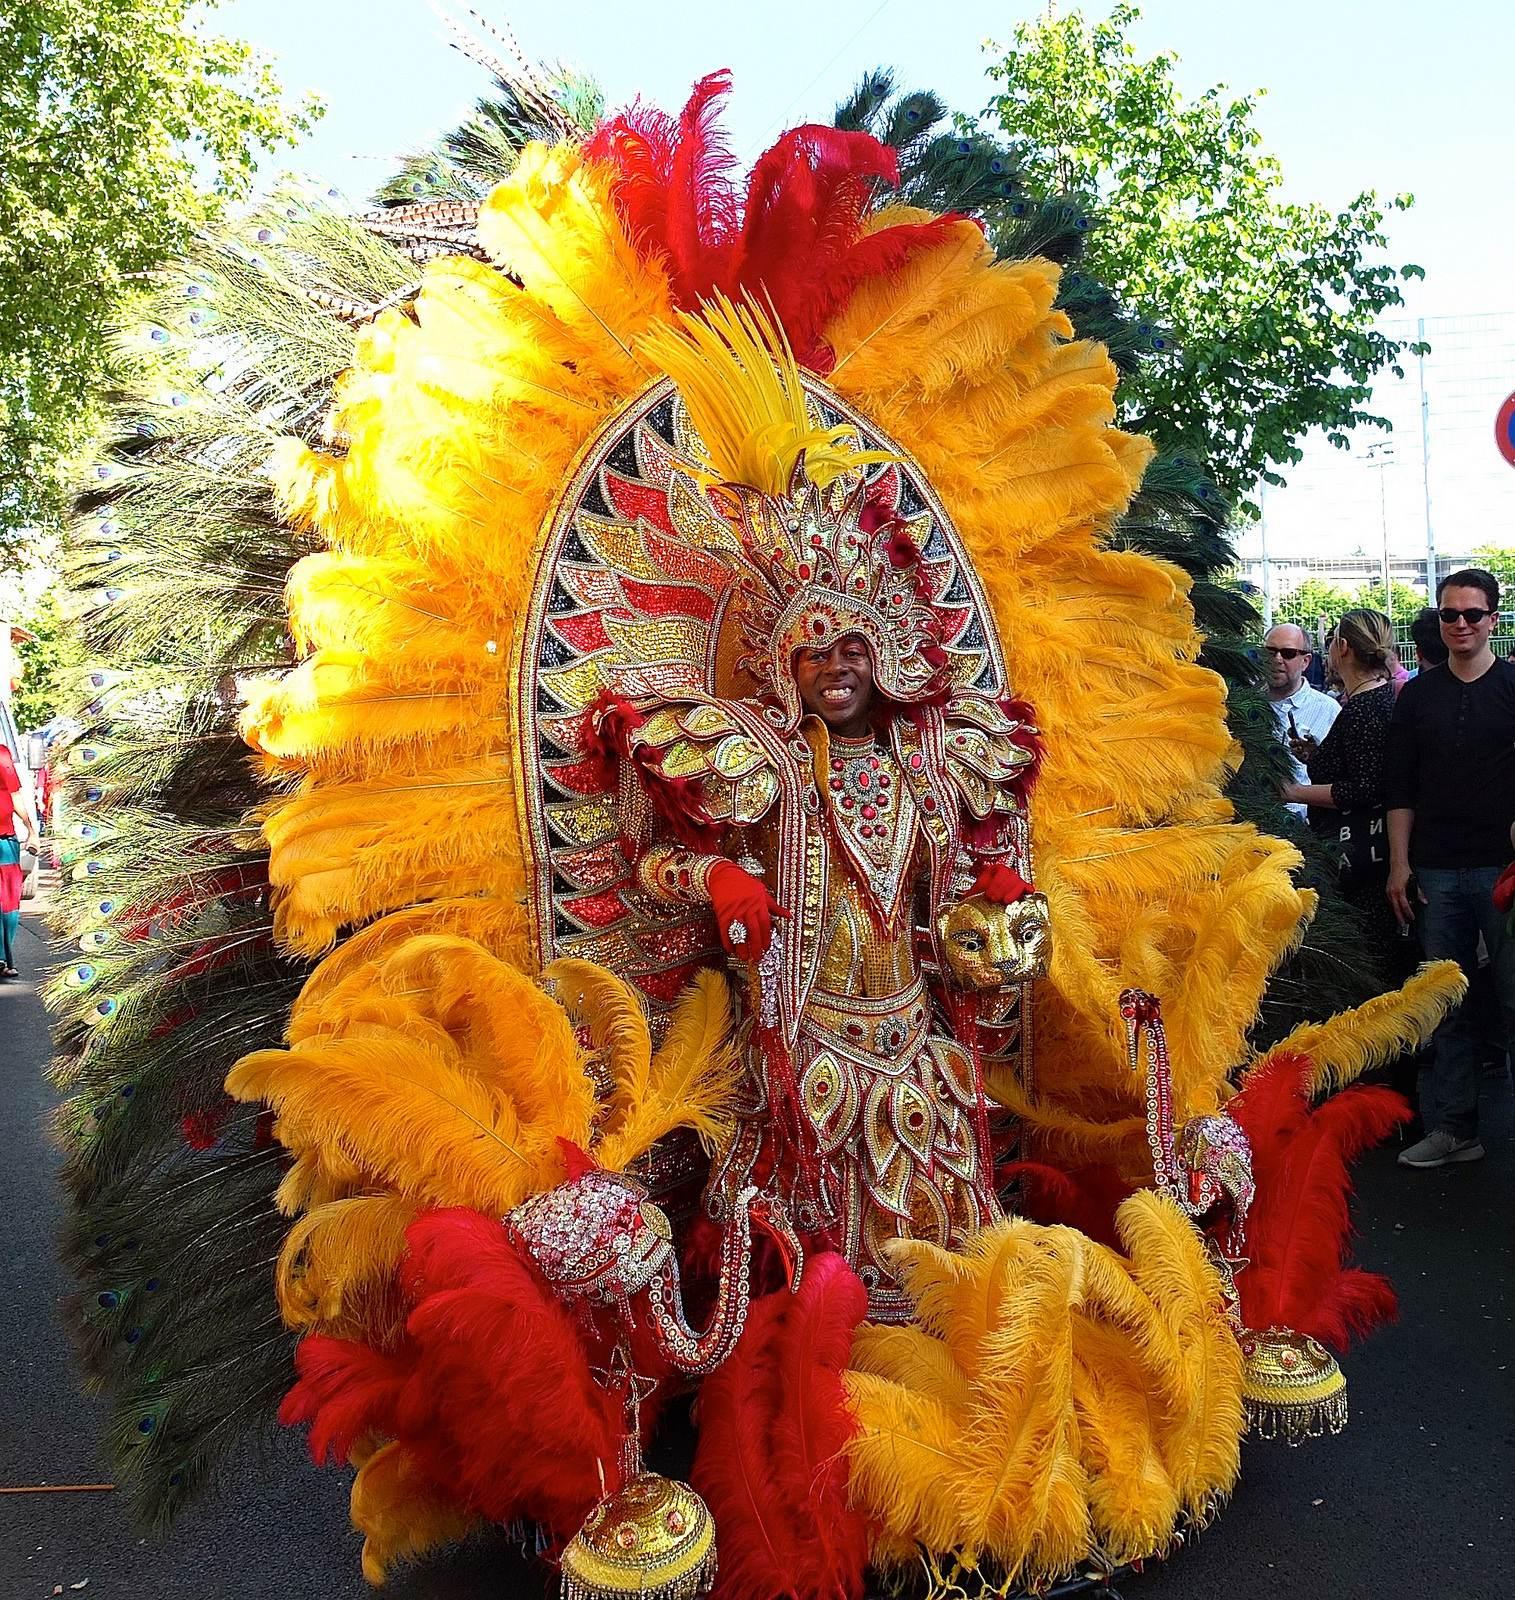 karnevalderkulturen KdK   Karneval der Kulturen in Berlin (Carnival of Cultures)